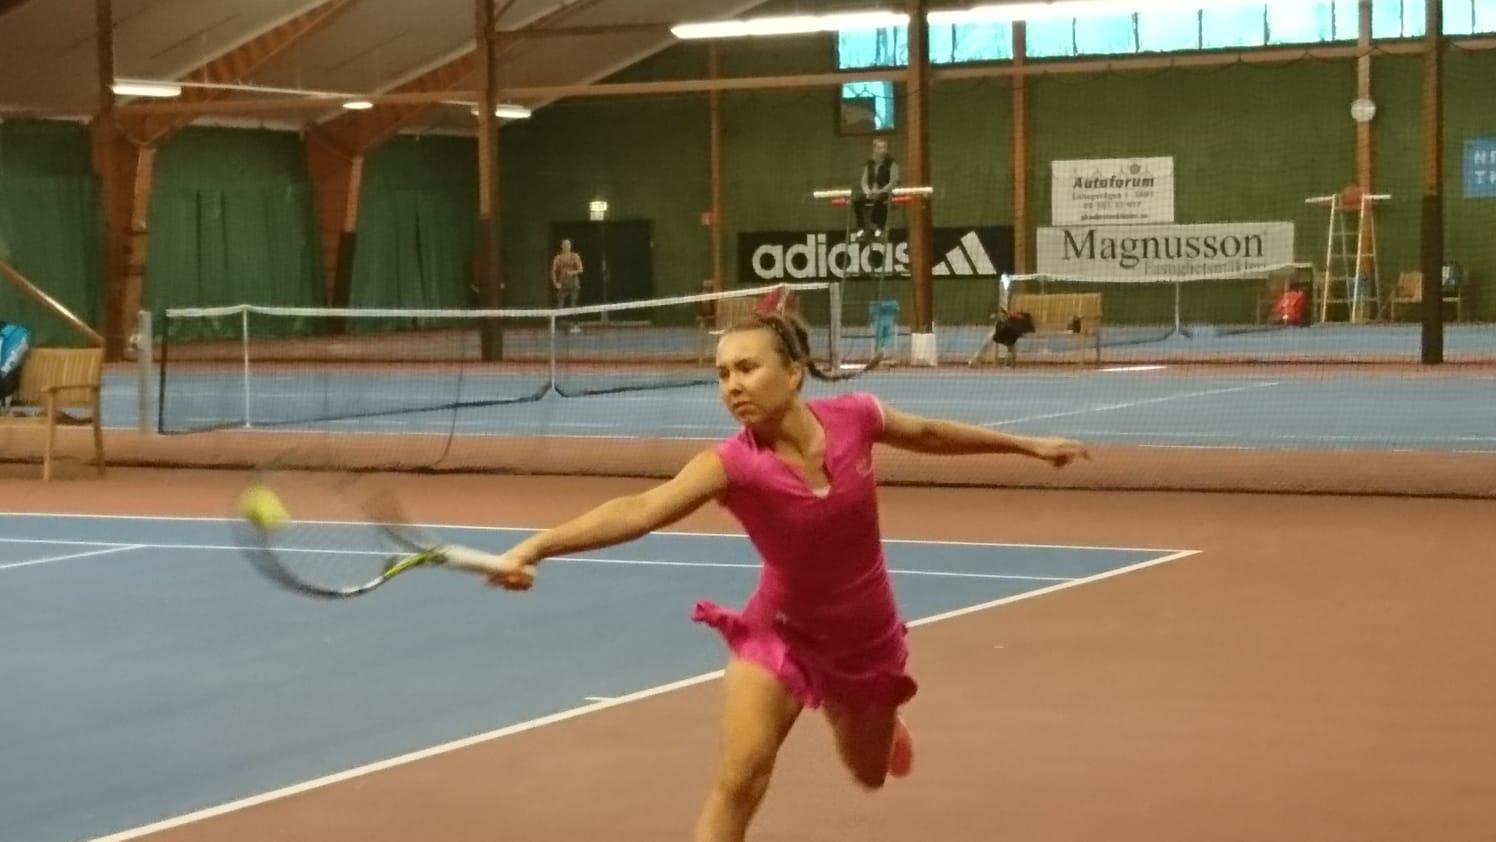 Julia Lövqvist